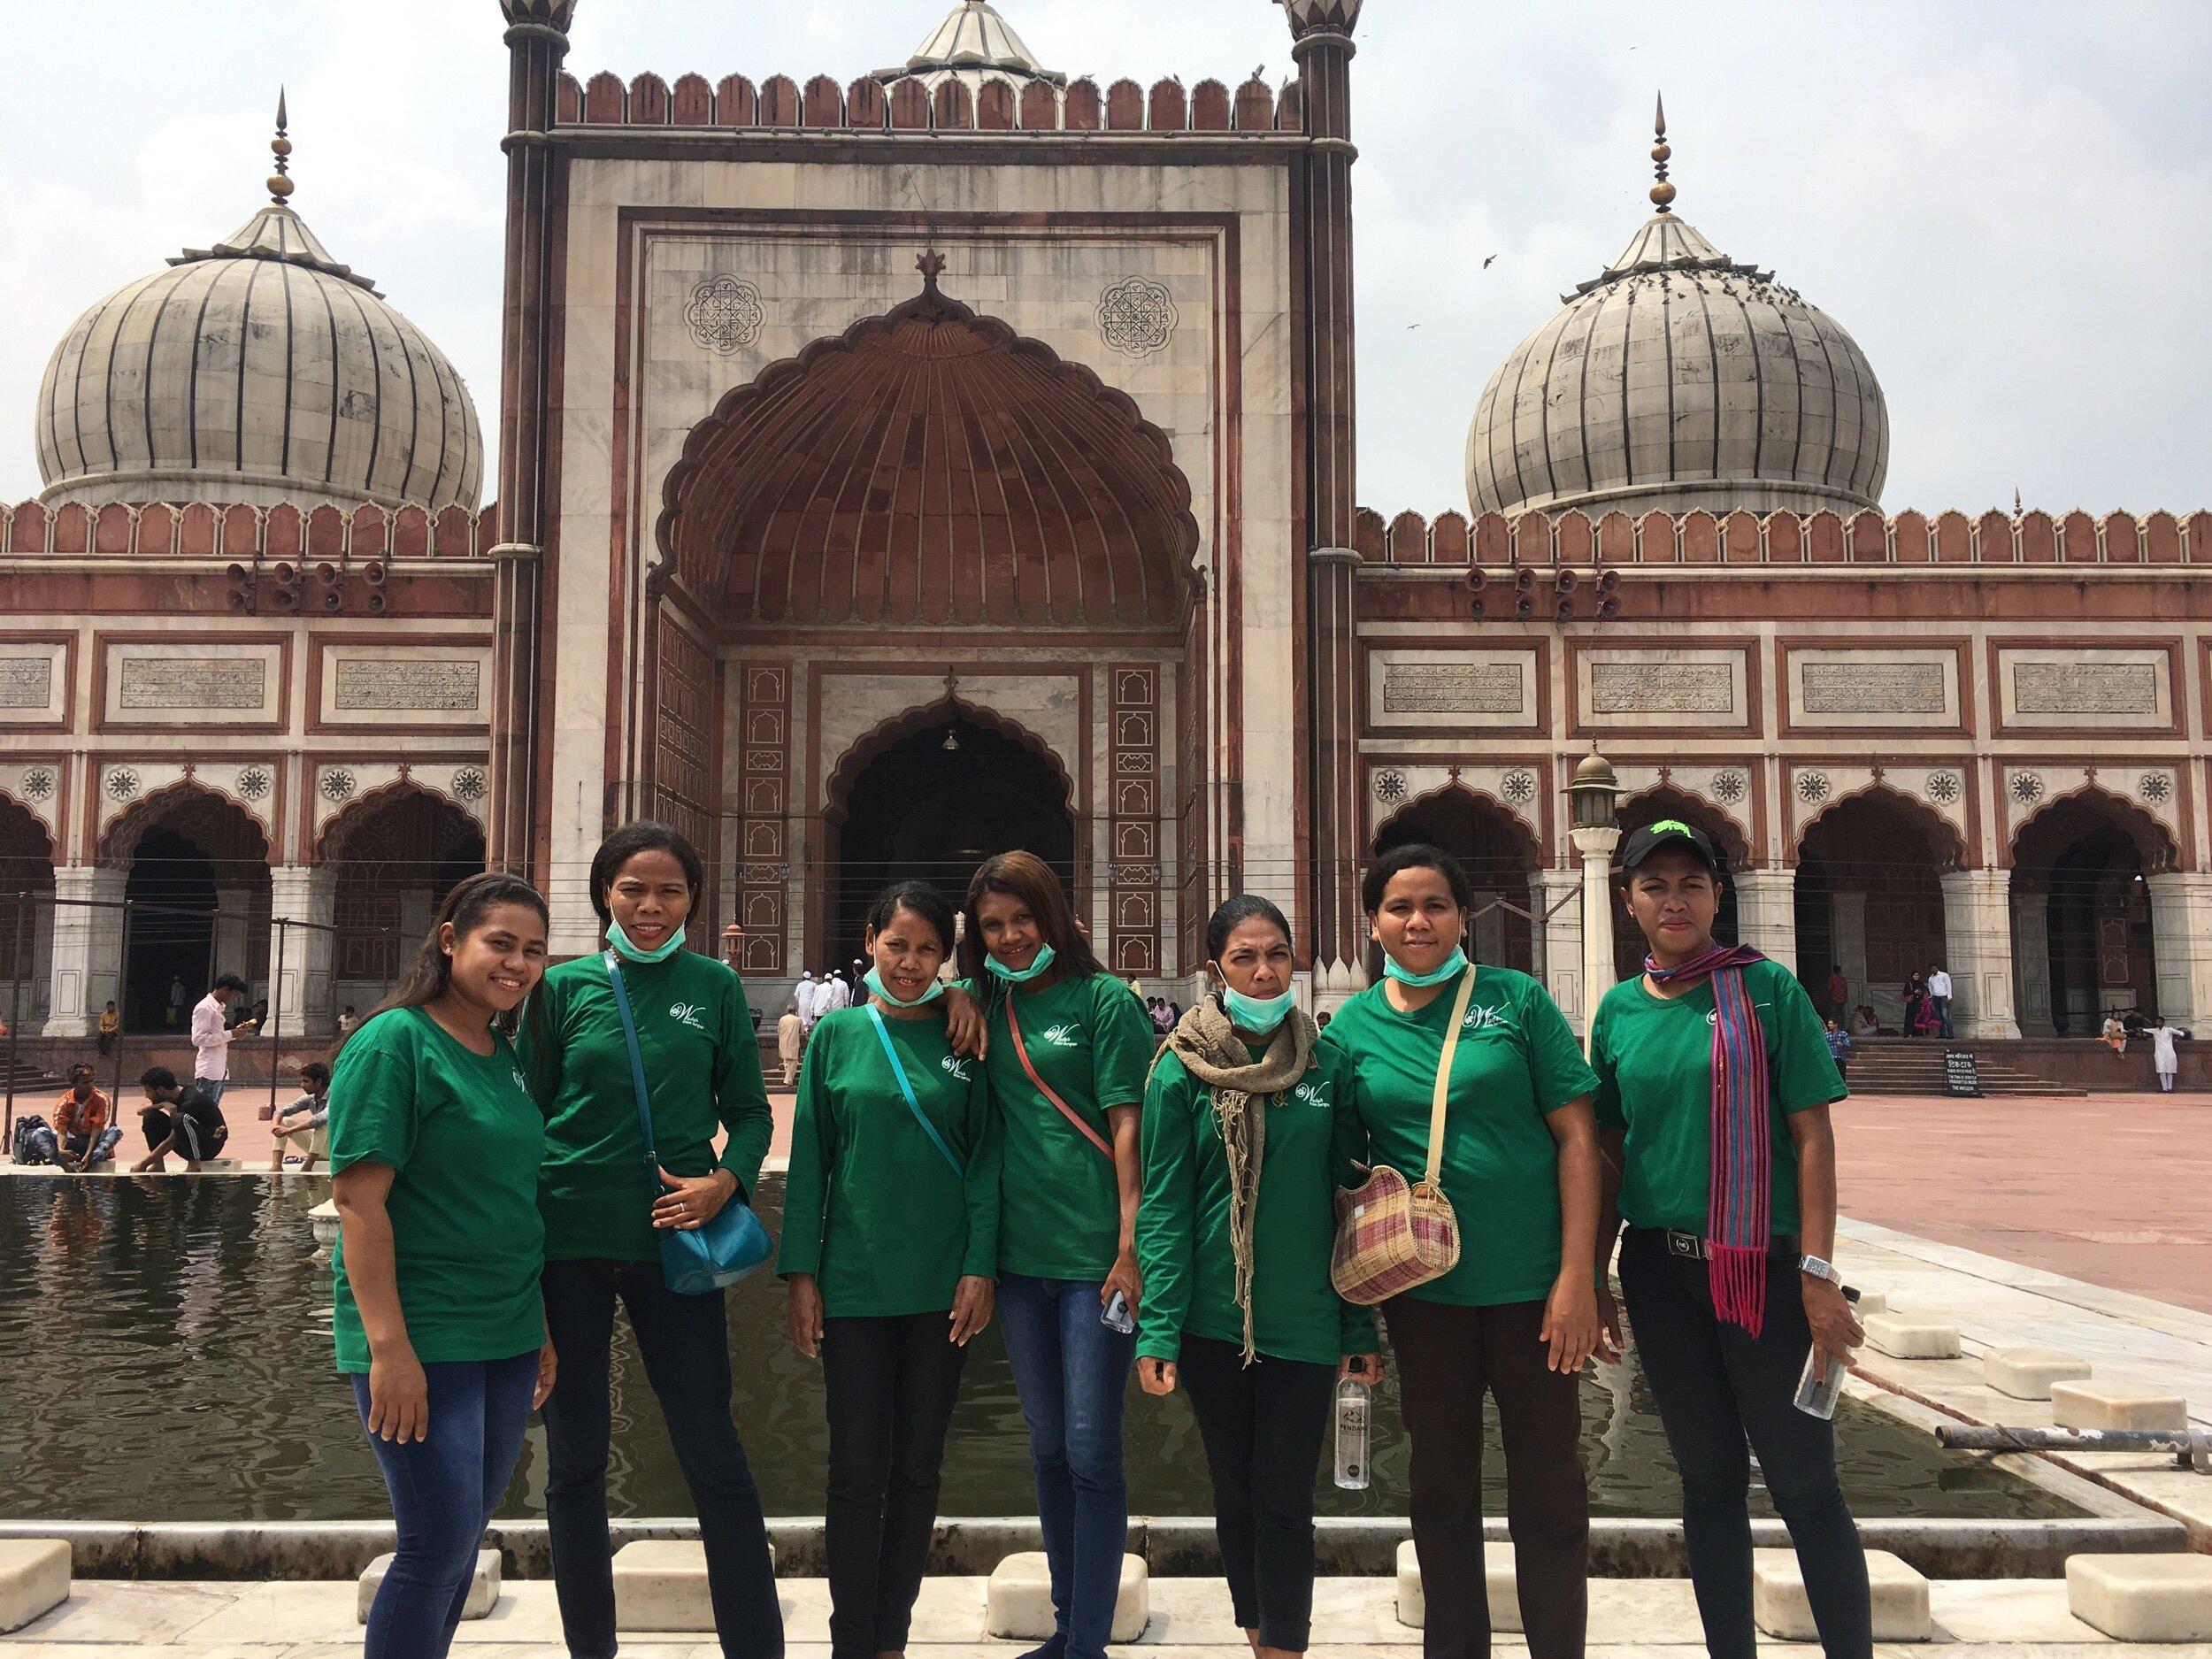 Solar mamas batch 4 arrive in India, L-R : Florida Teang, Yohana Tawa, Albina Bai, Ludgardis Tibu, Elisabeth Ndaru, Marselina Nena, Paulina Toyo